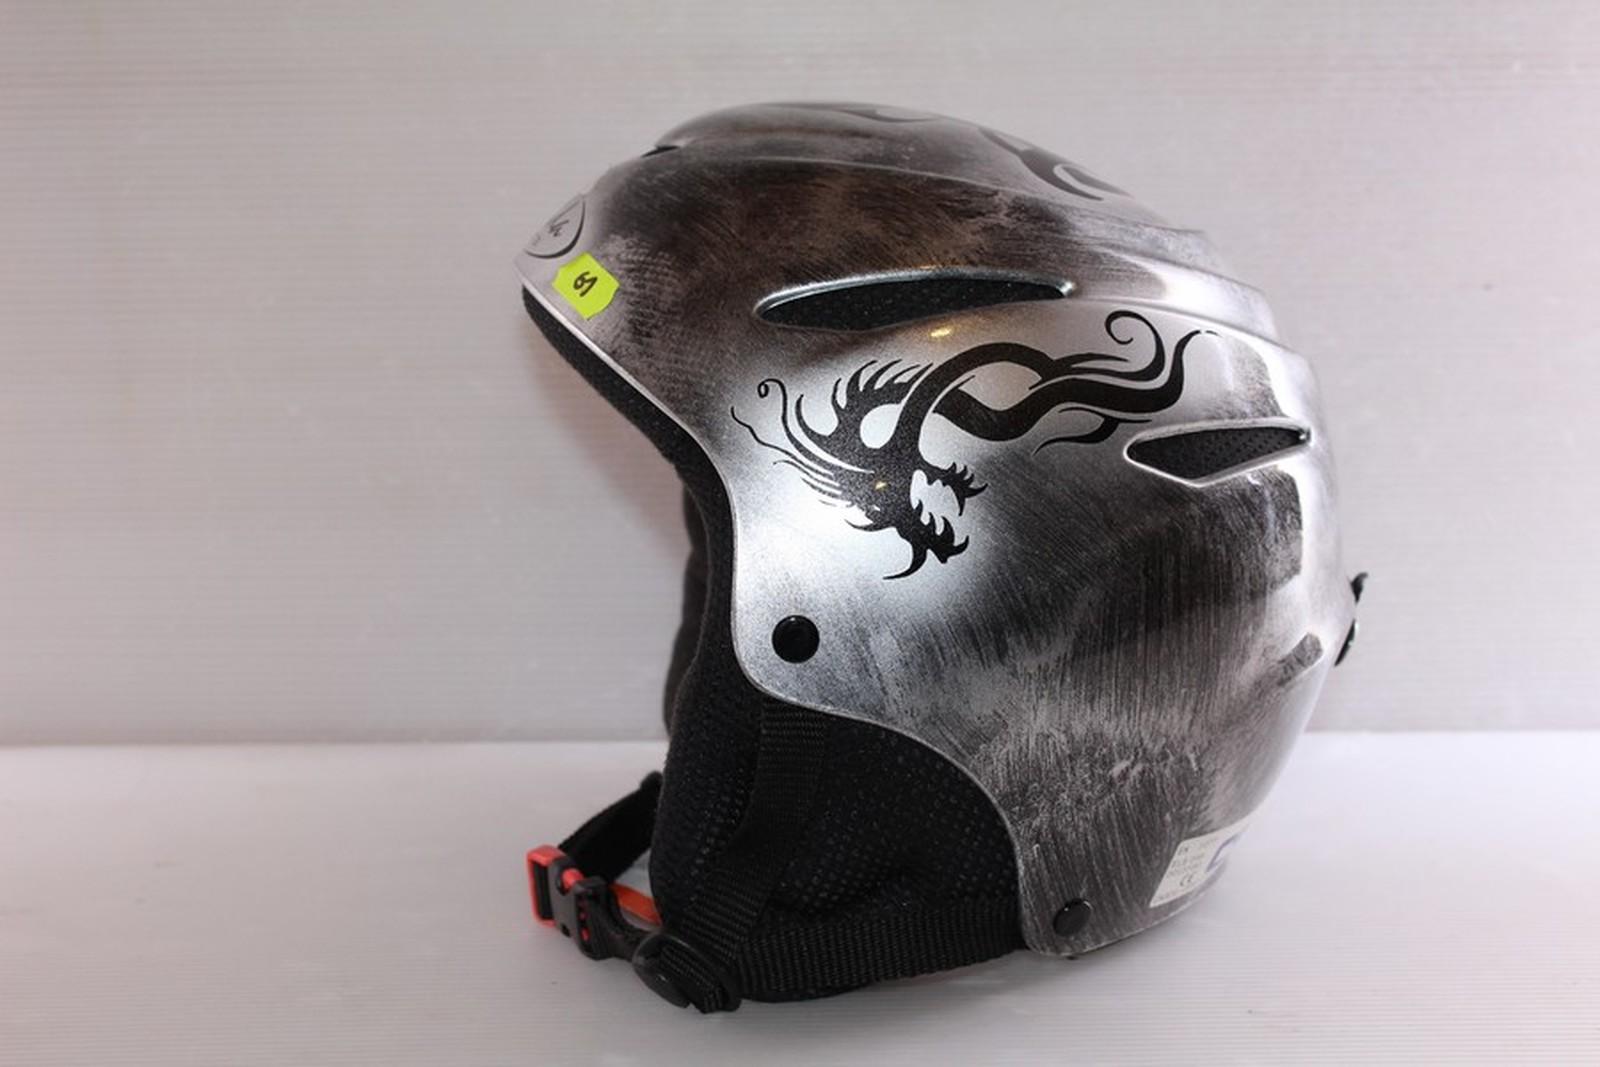 Lyžařská helma Mivida X-style tatoo vel. 61